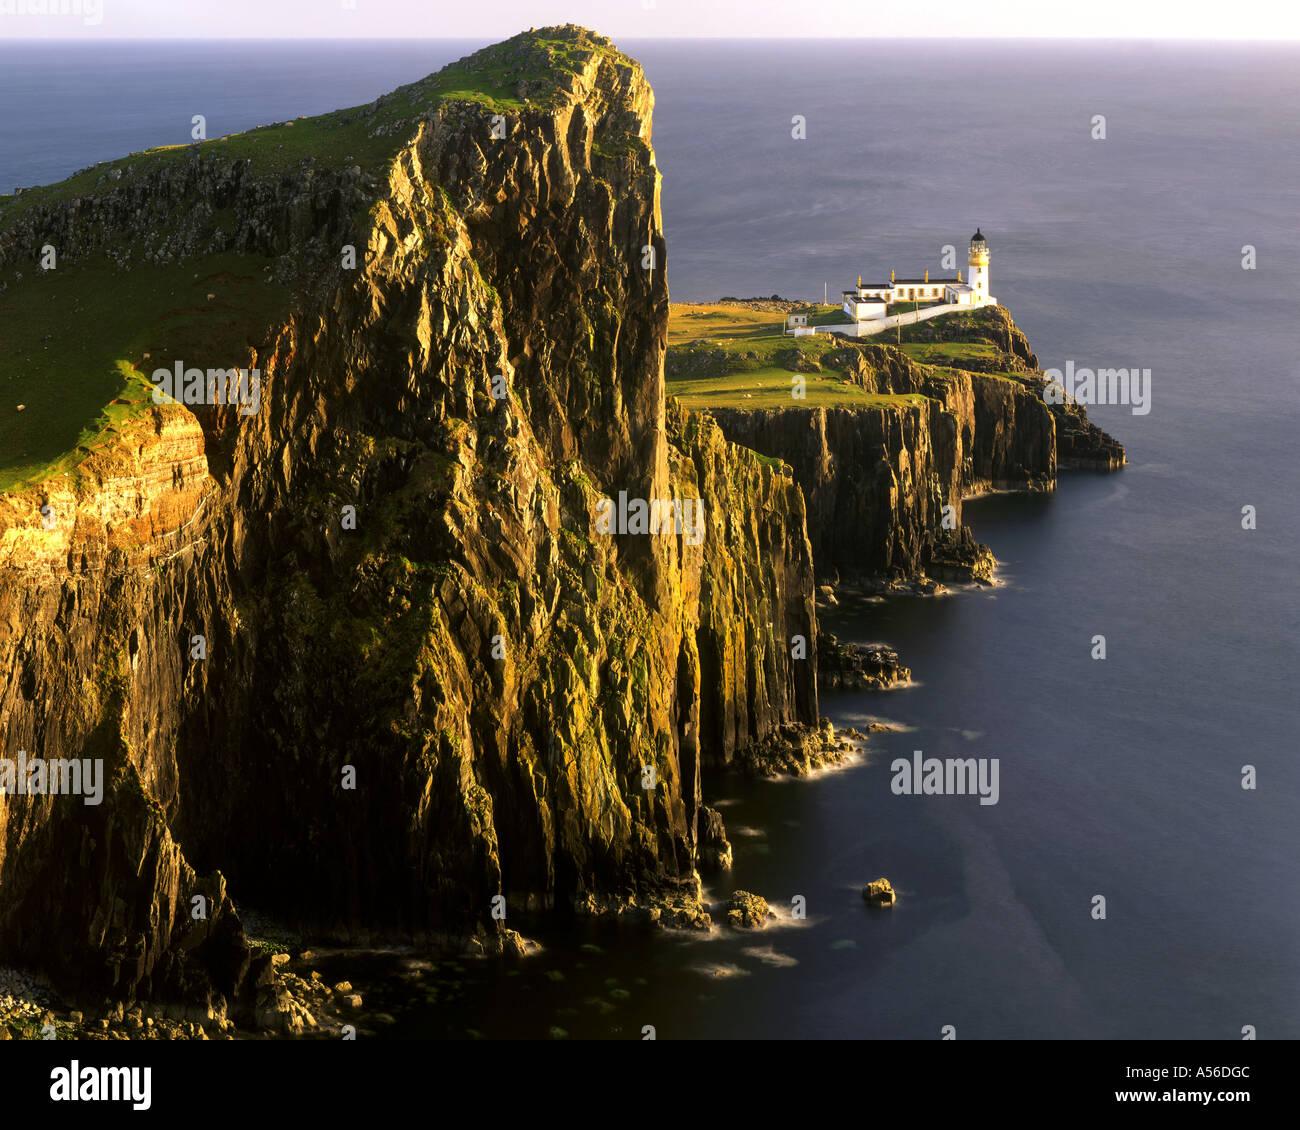 GB - SCOTLAND:  Neist Lighthouse on the Isle of Skye - Stock Image